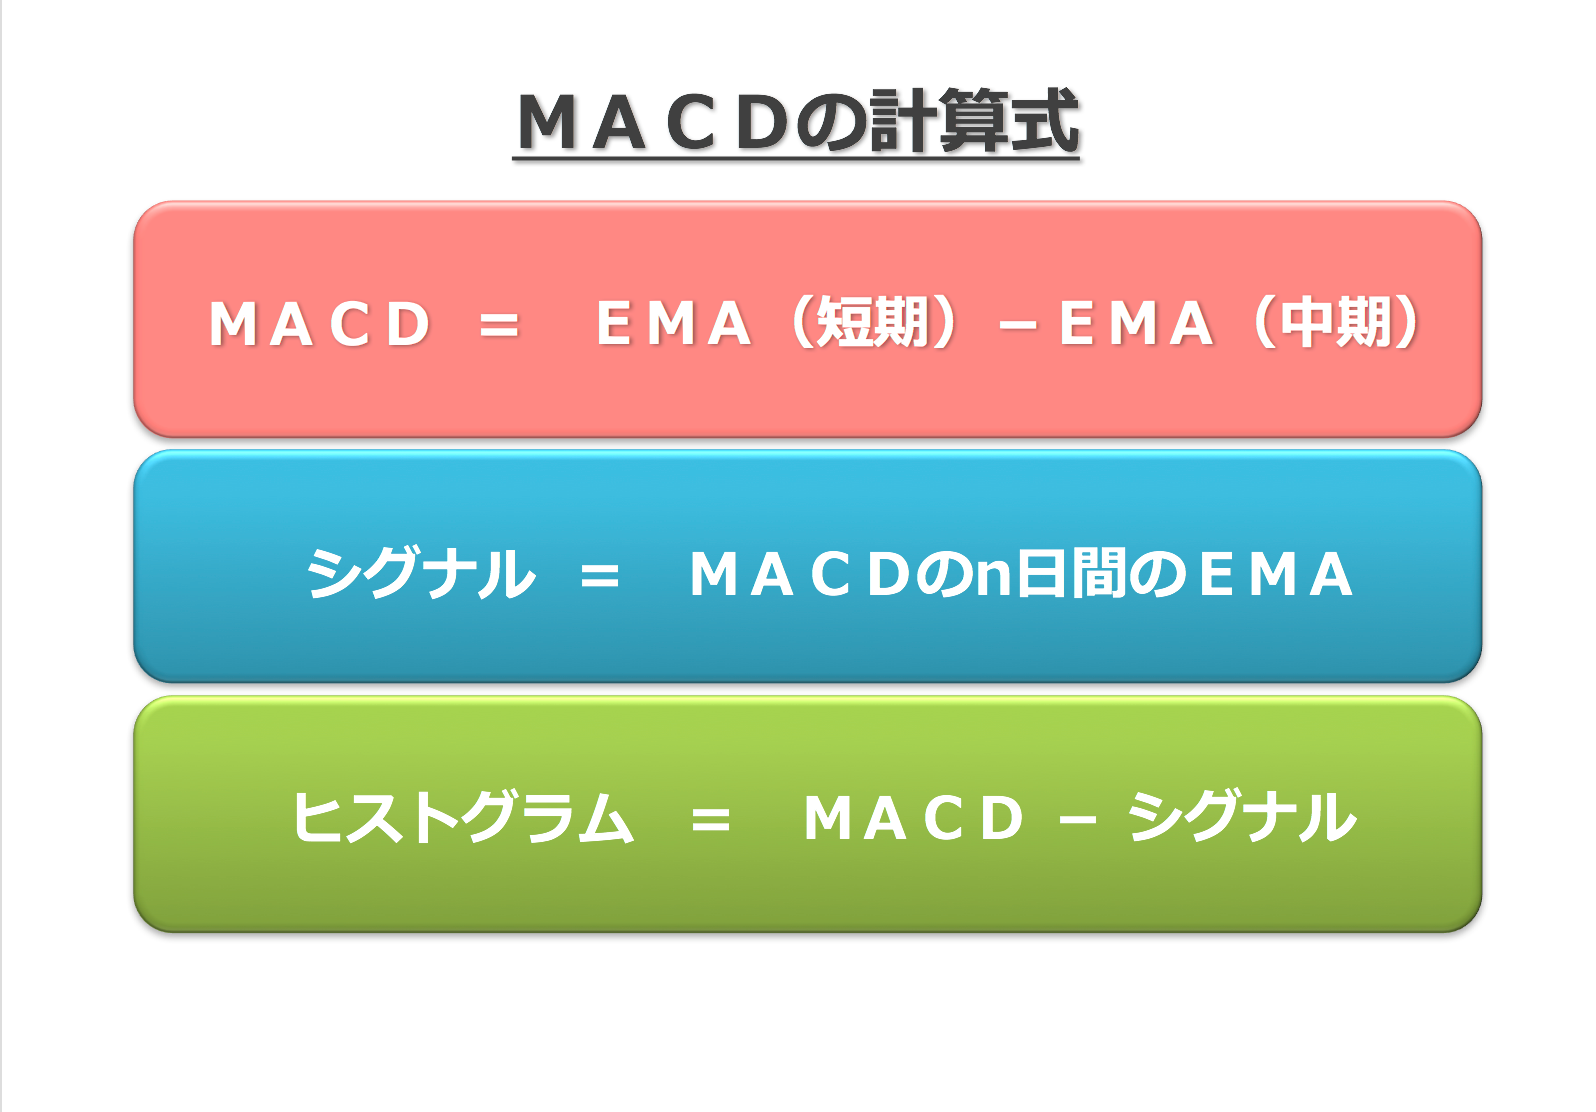 MACDの計算式